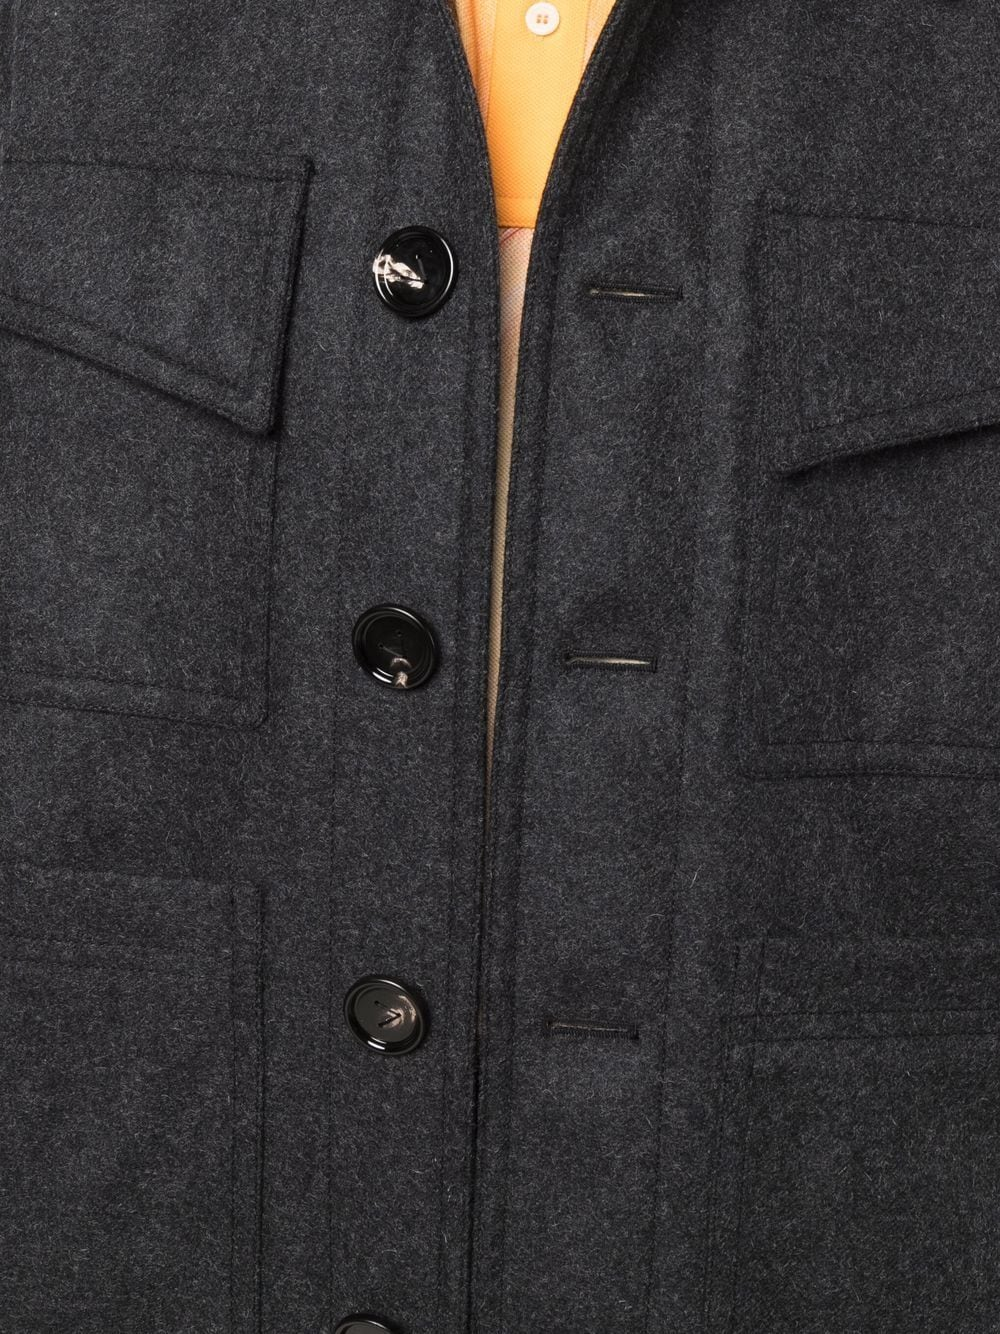 Picture of Bottega Veneta | Button-Up Tailored Wool Coat